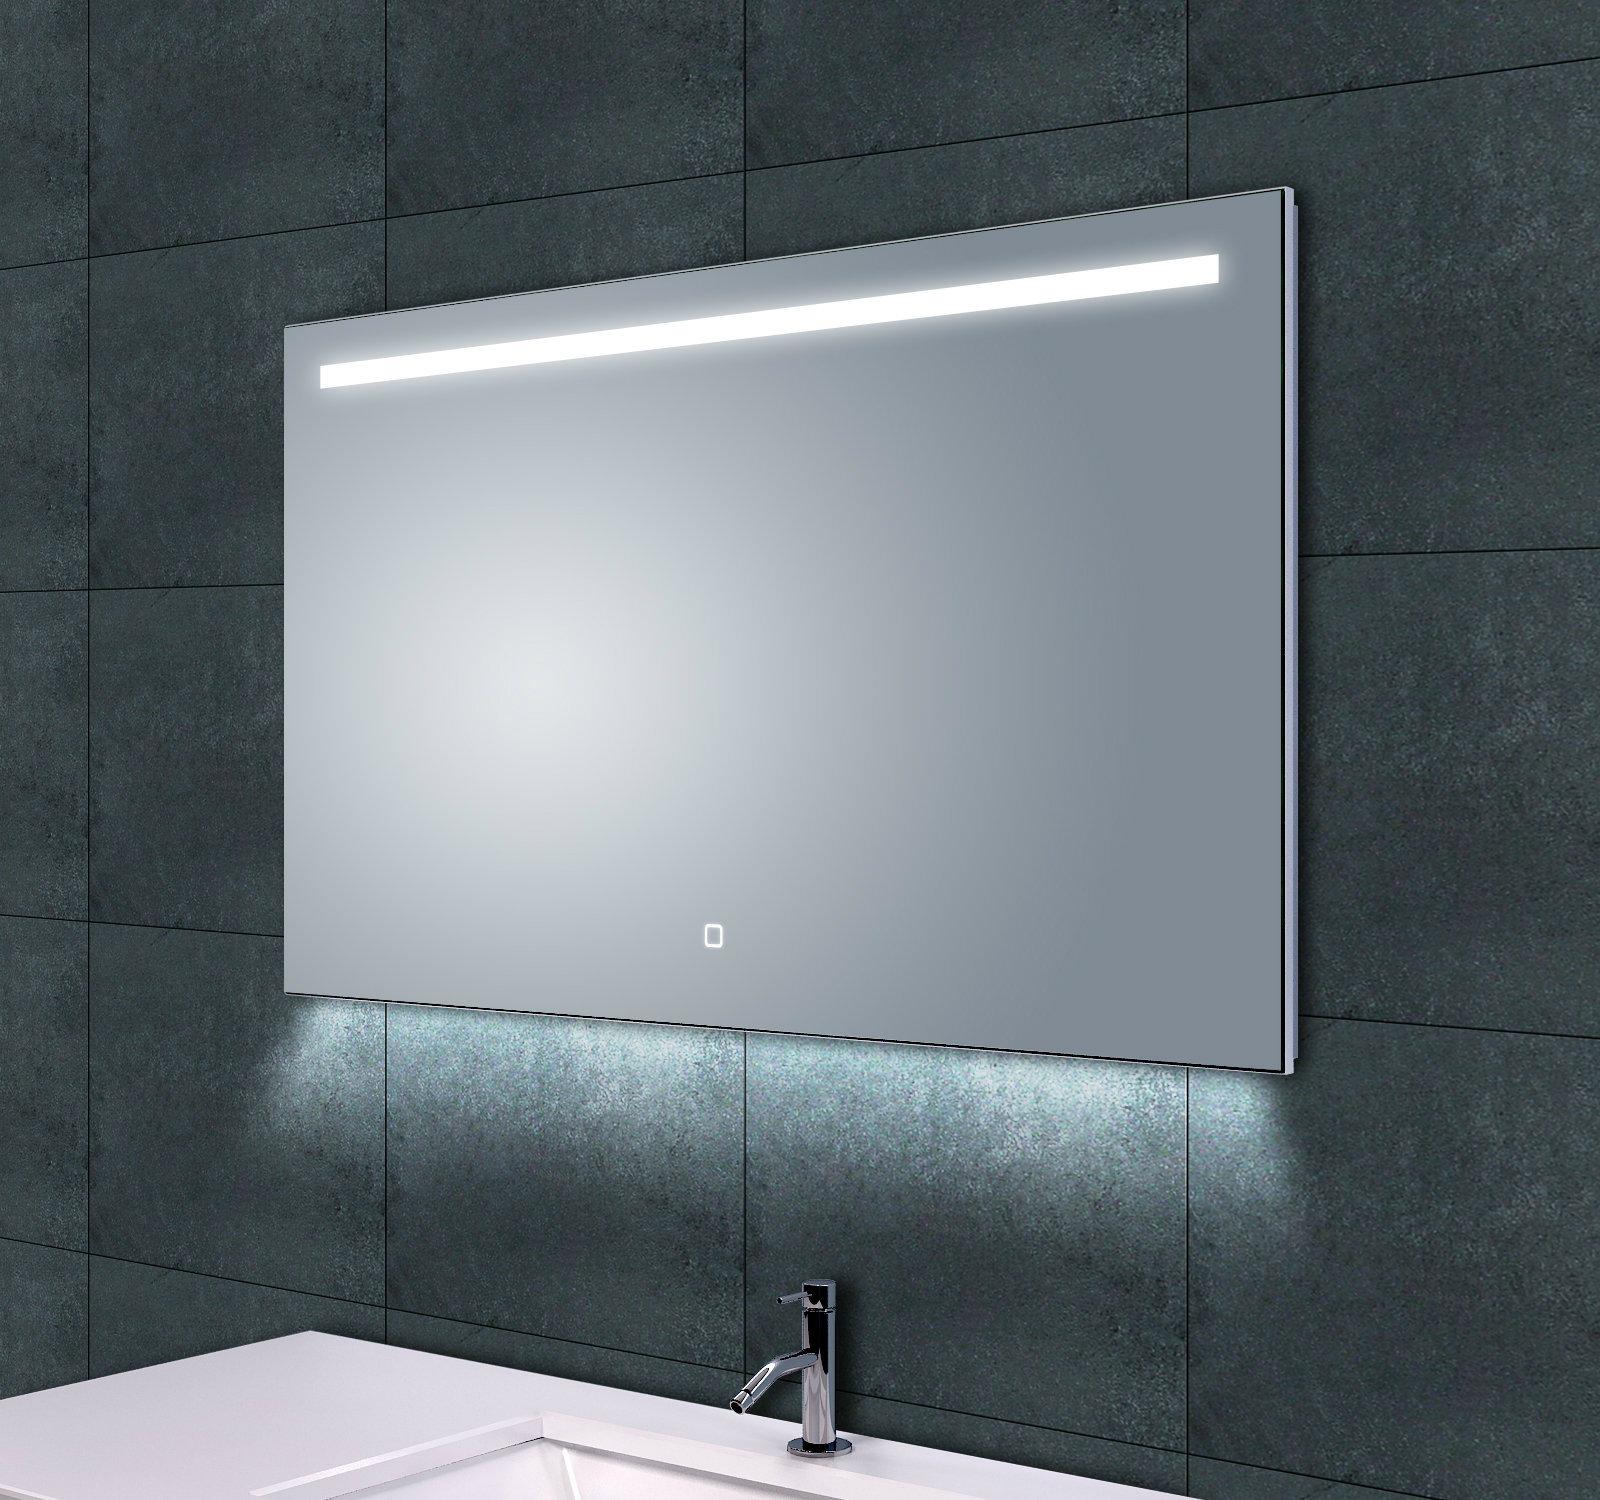 arcon dimbare badkamerspiegel x cm met led verlichting. Black Bedroom Furniture Sets. Home Design Ideas